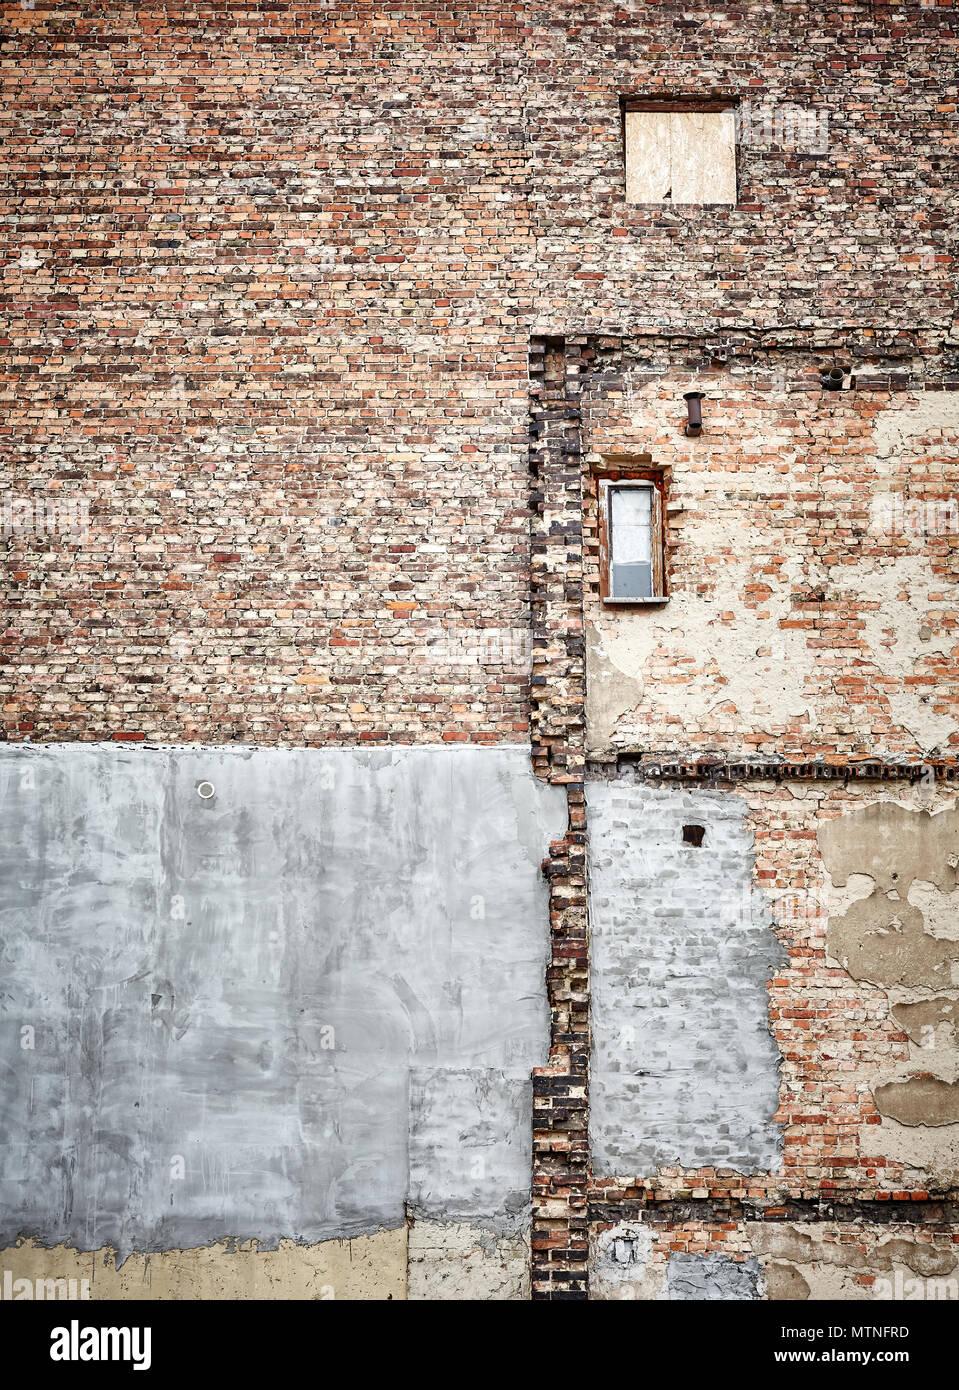 Demolished old brick building wall, grunge background. - Stock Image